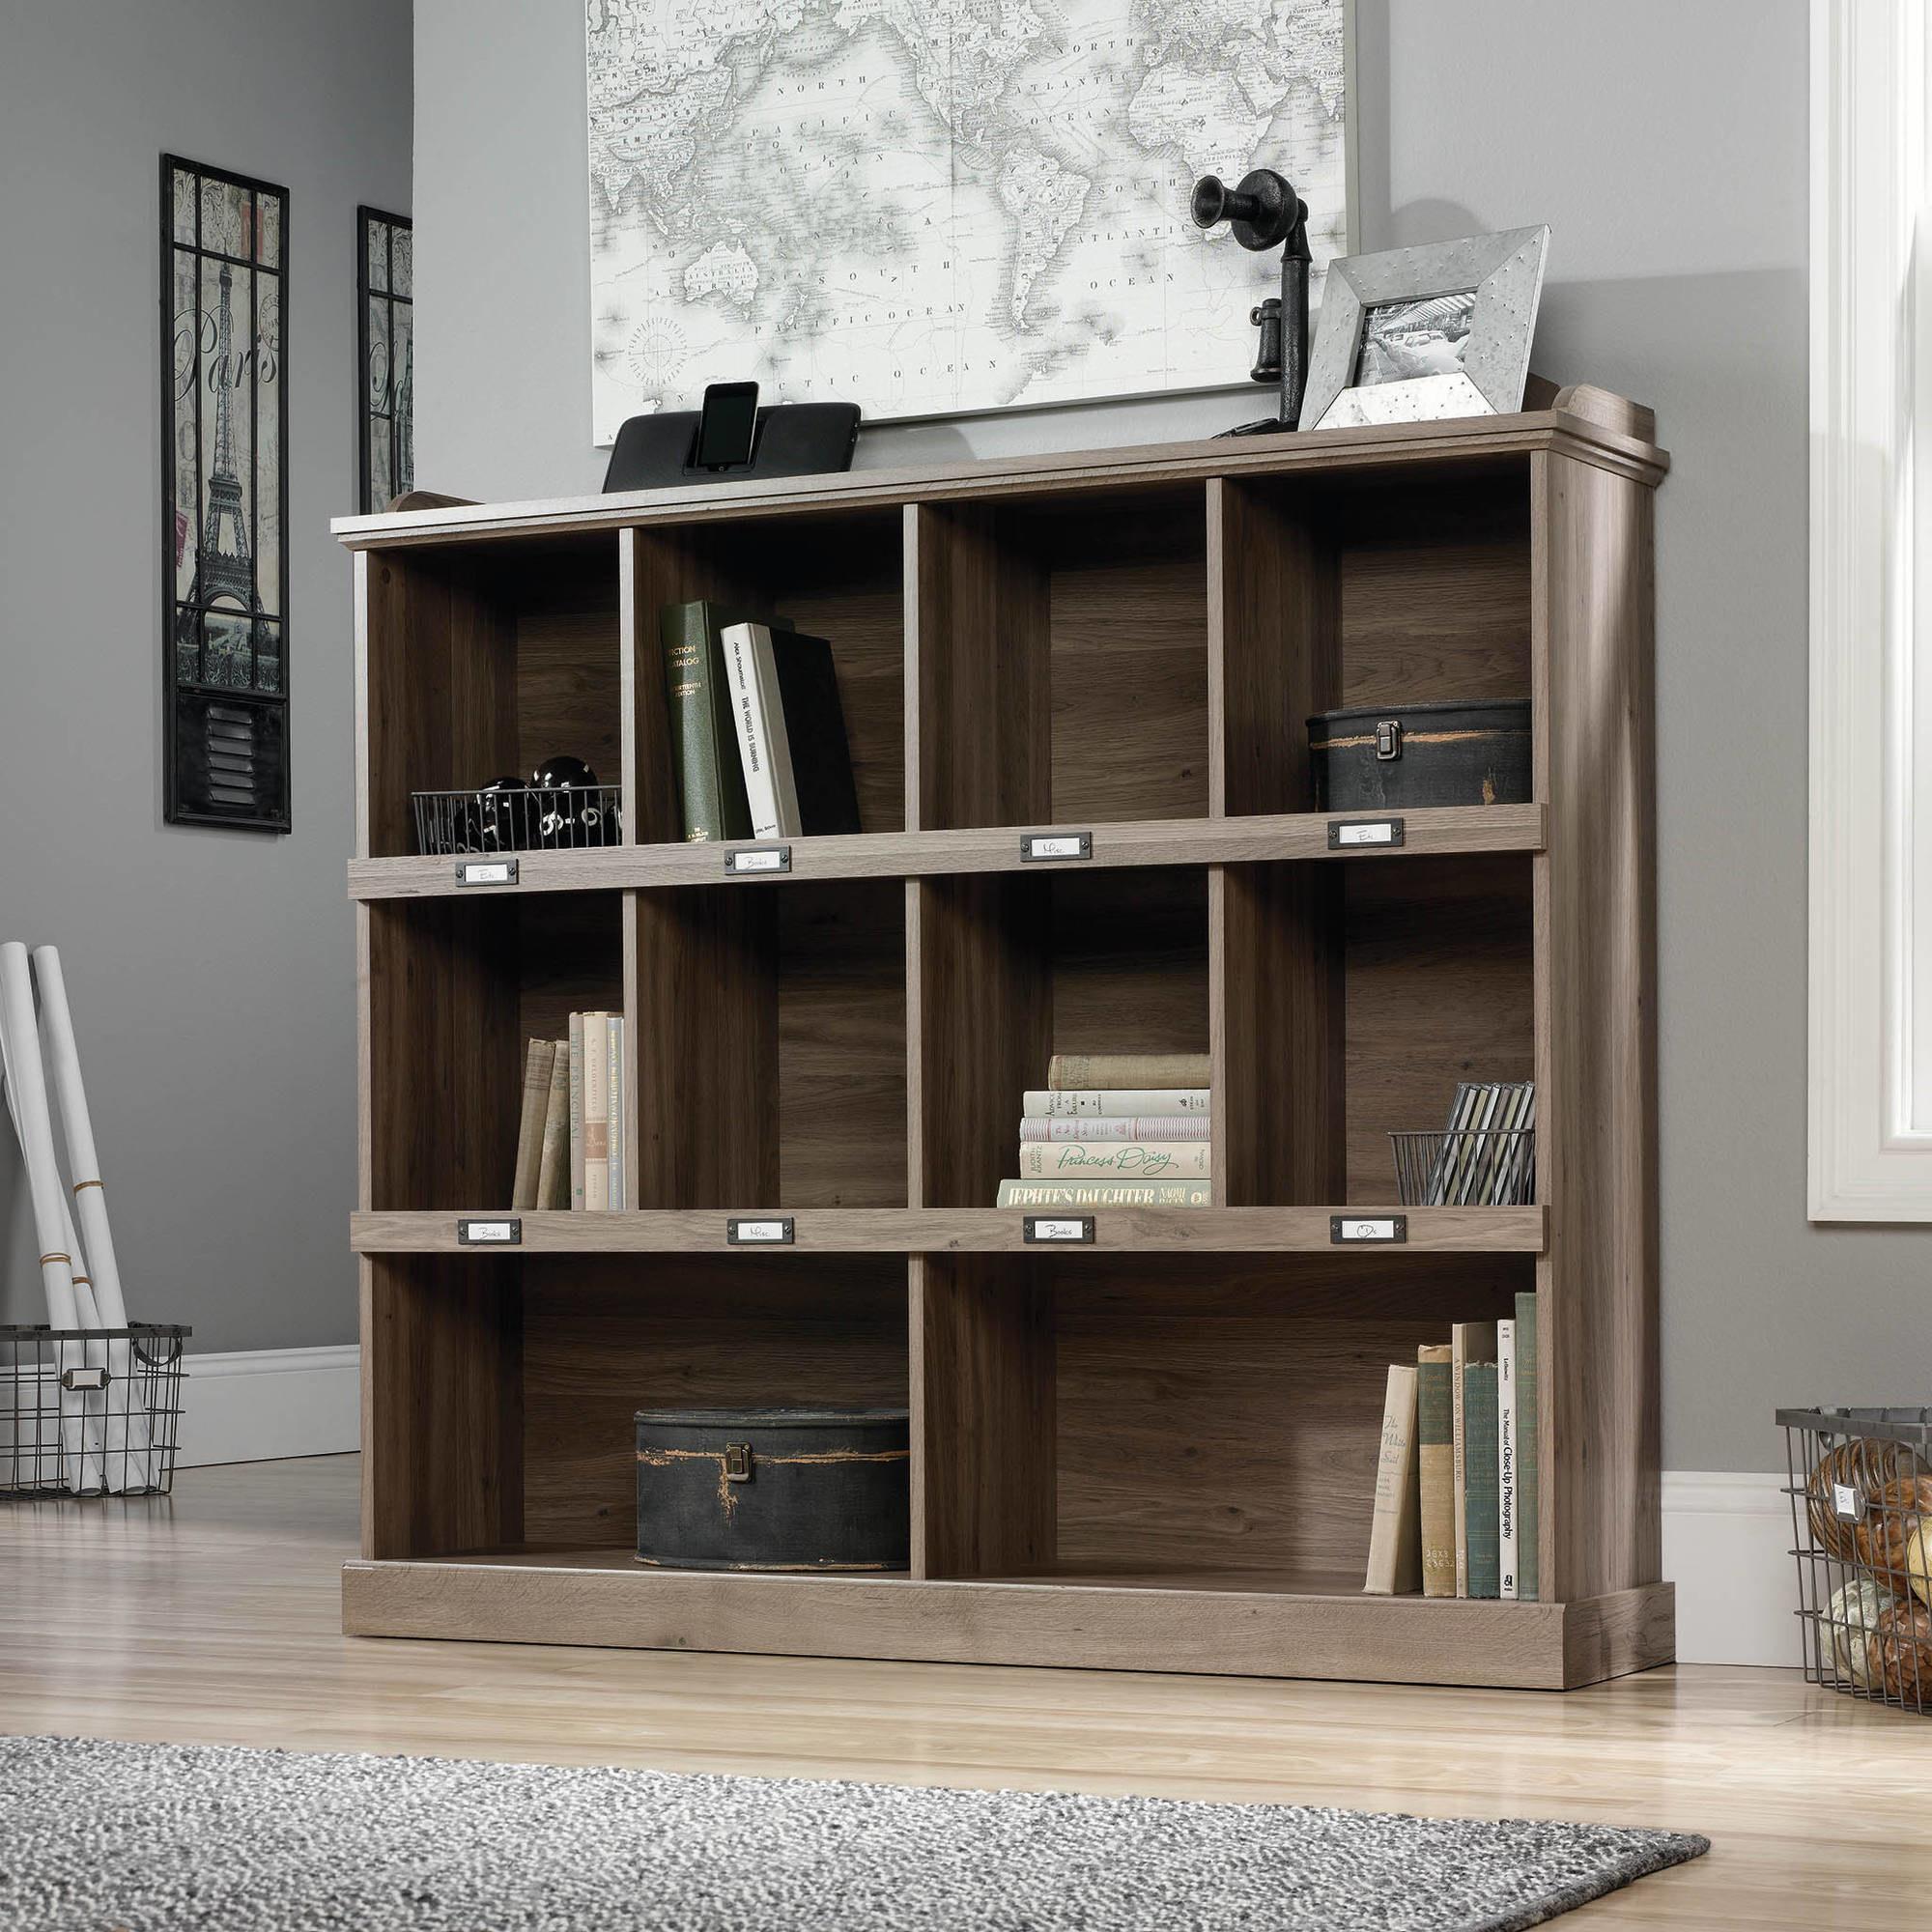 Salt Oak finished three row bookcase